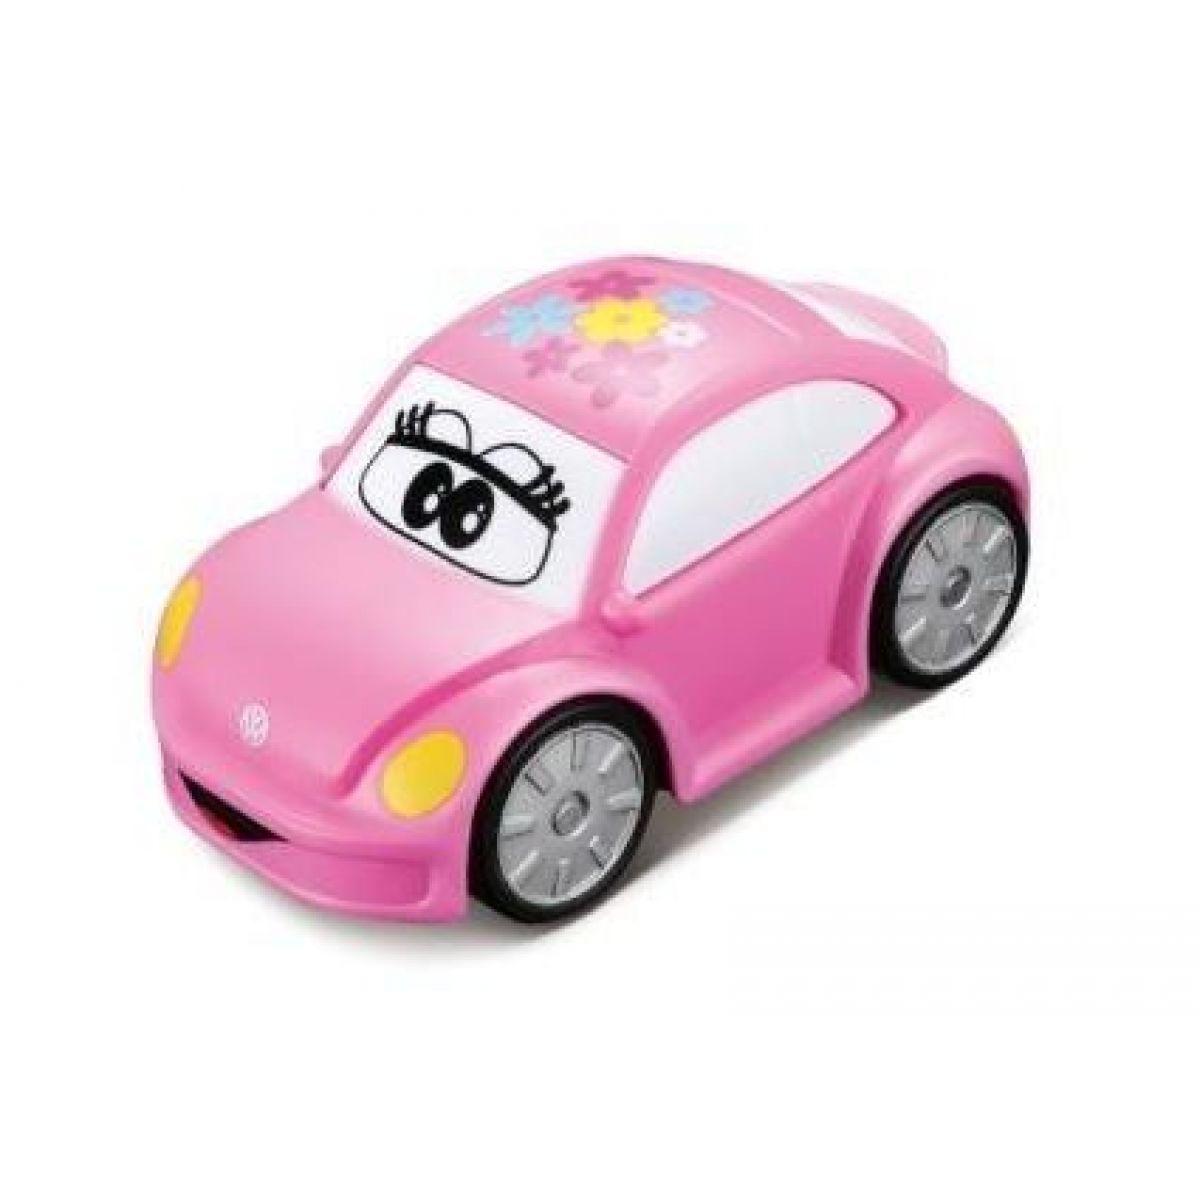 Bburago Volkswagen Beetle plastové autíčko růžové